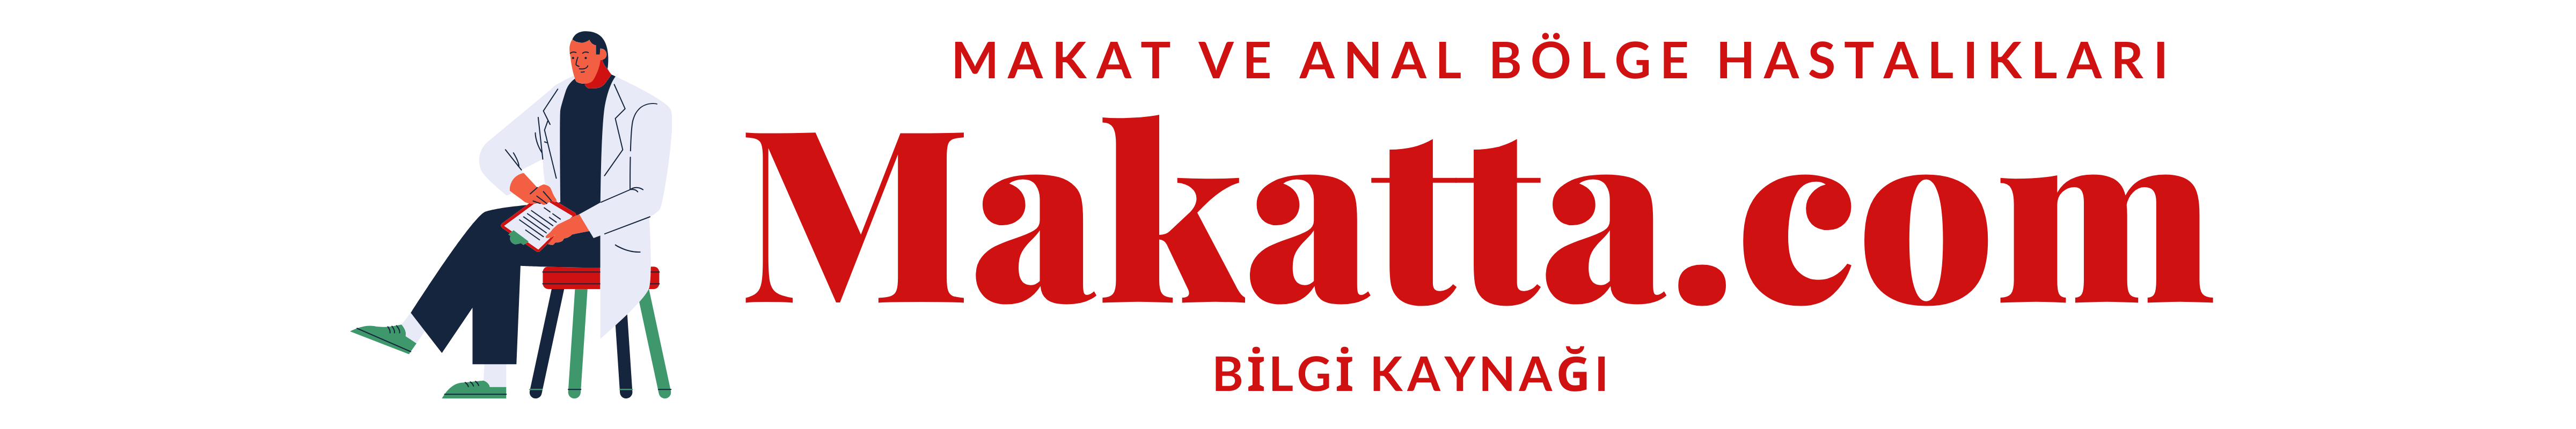 Makatta.com